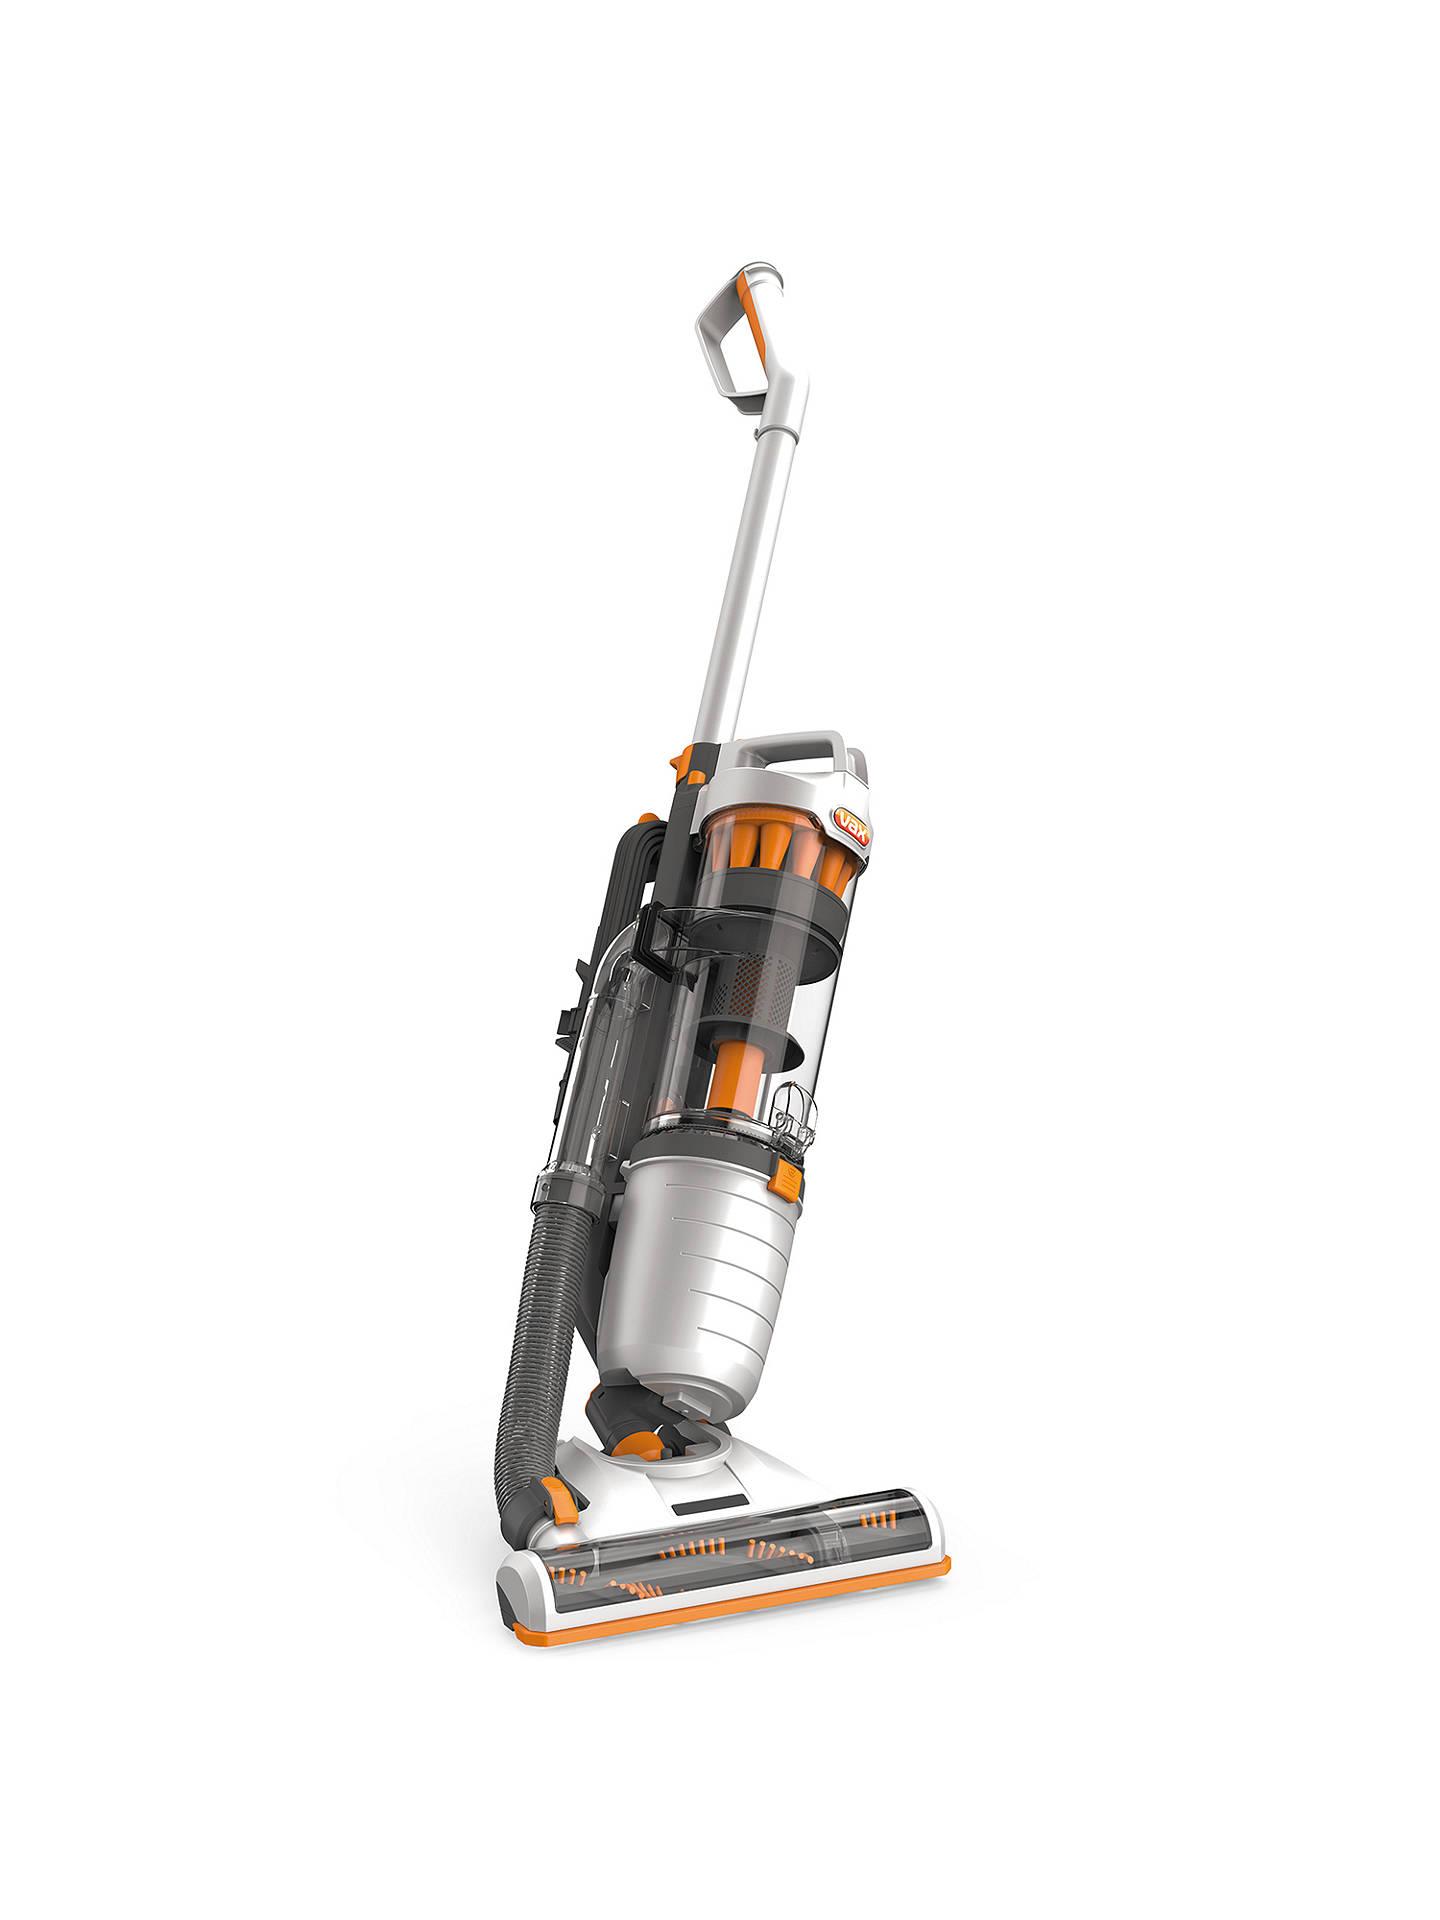 Vax U86-AC-Be Air3 Compact Upright Vacuum Cleaner at John